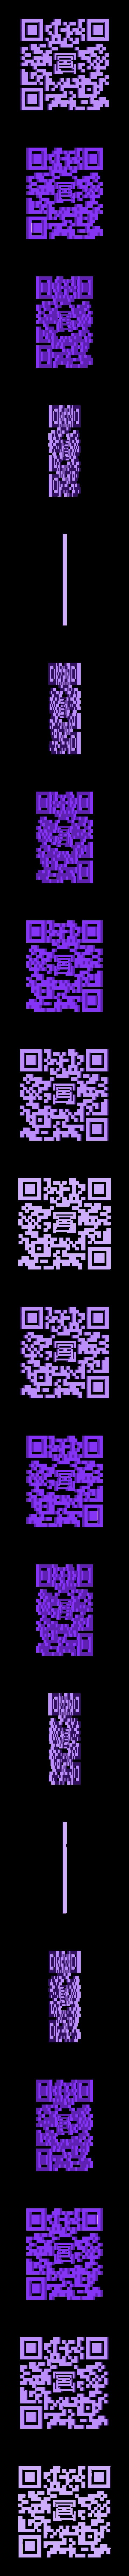 black.stl Download STL file MMU QR code • 3D printing object, DoubekDesign